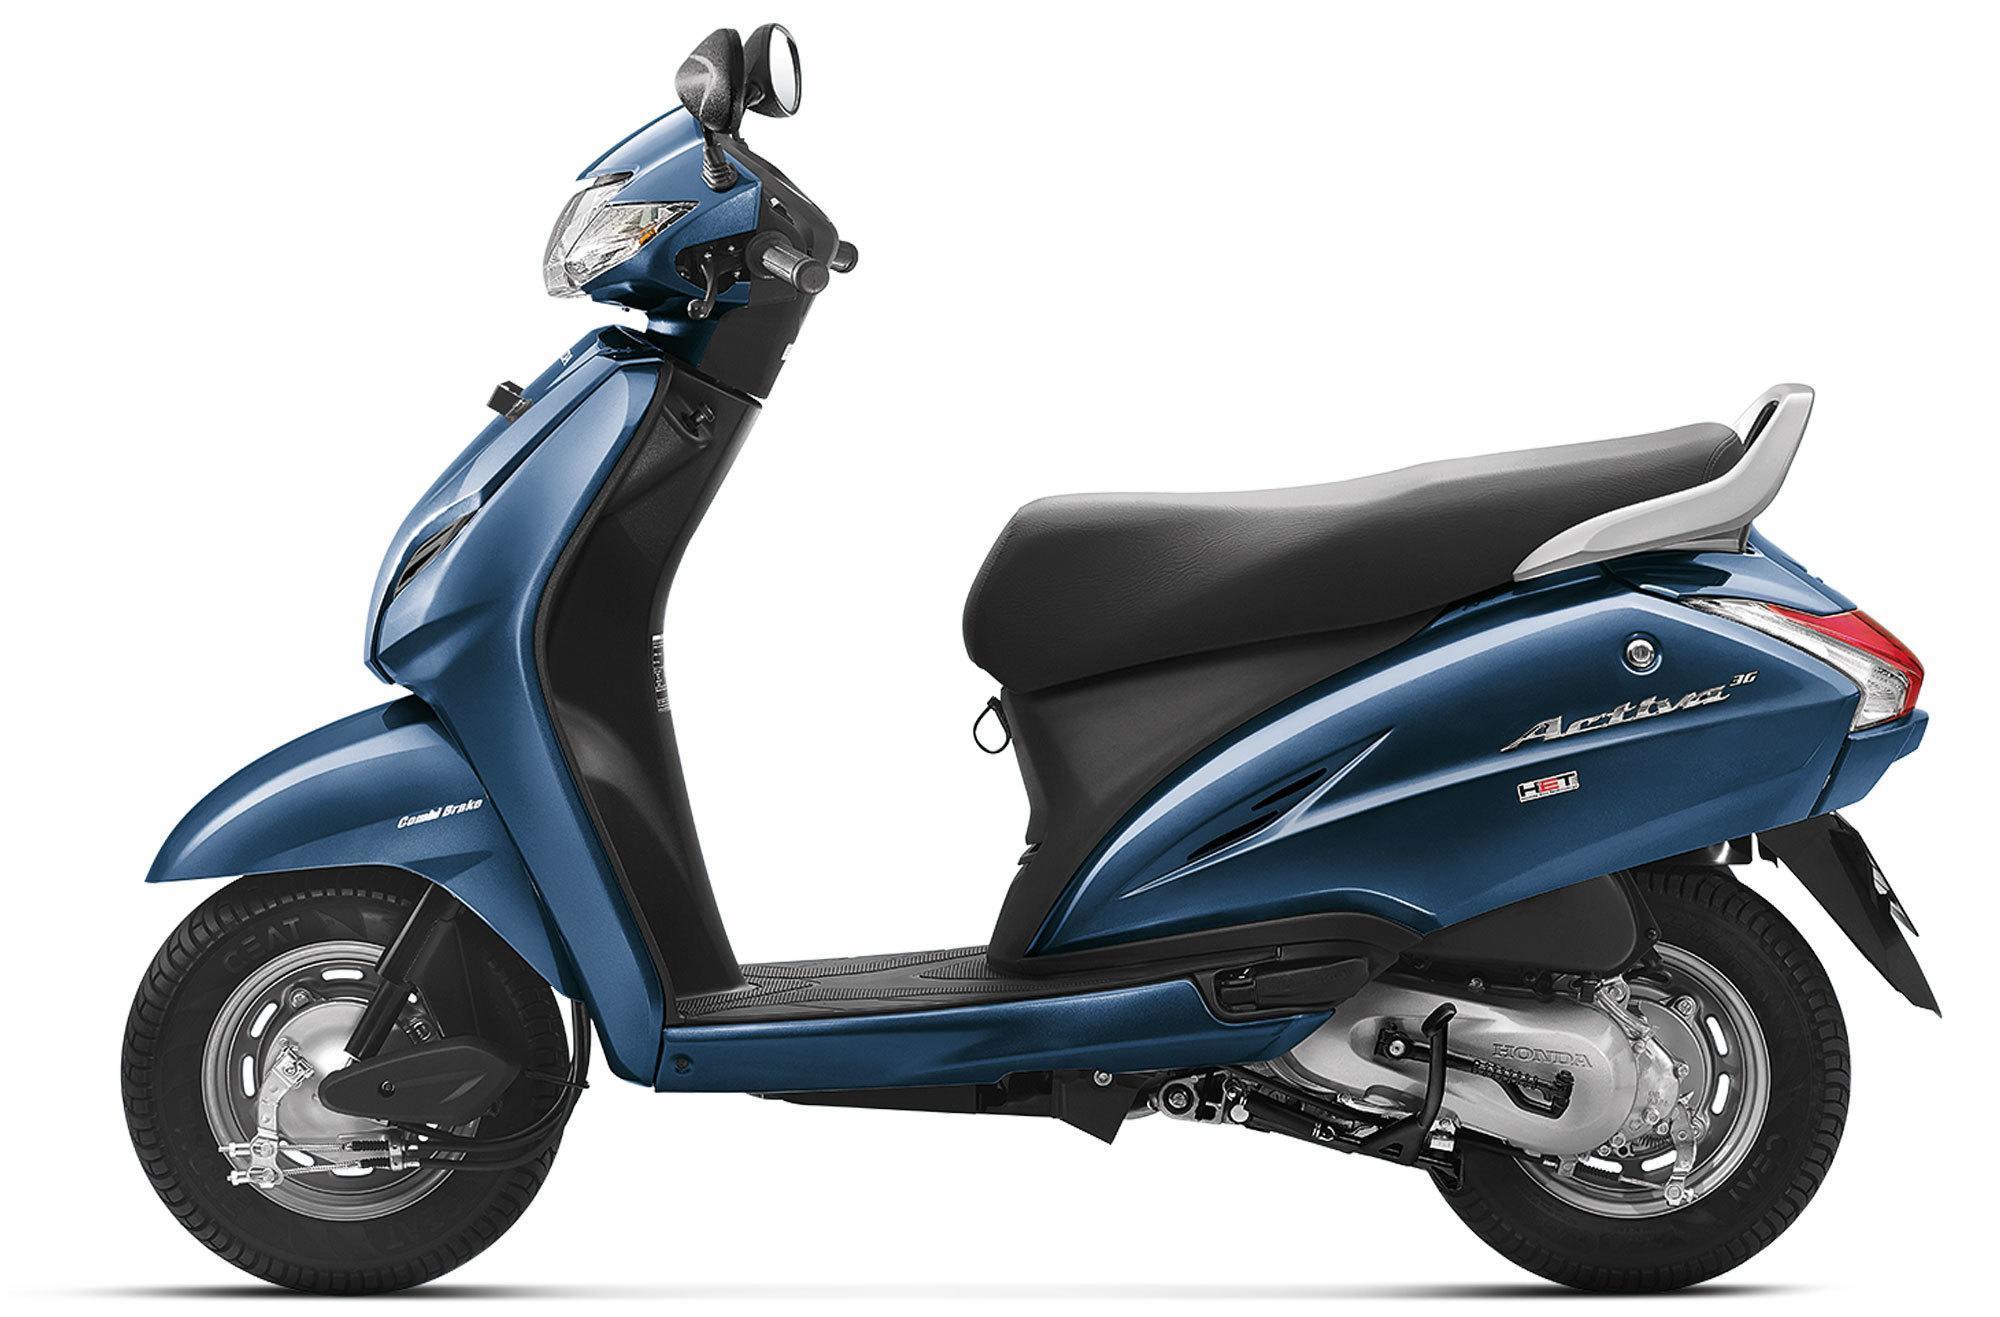 Honda Activa 3g Price Mileage Review Honda Bikes